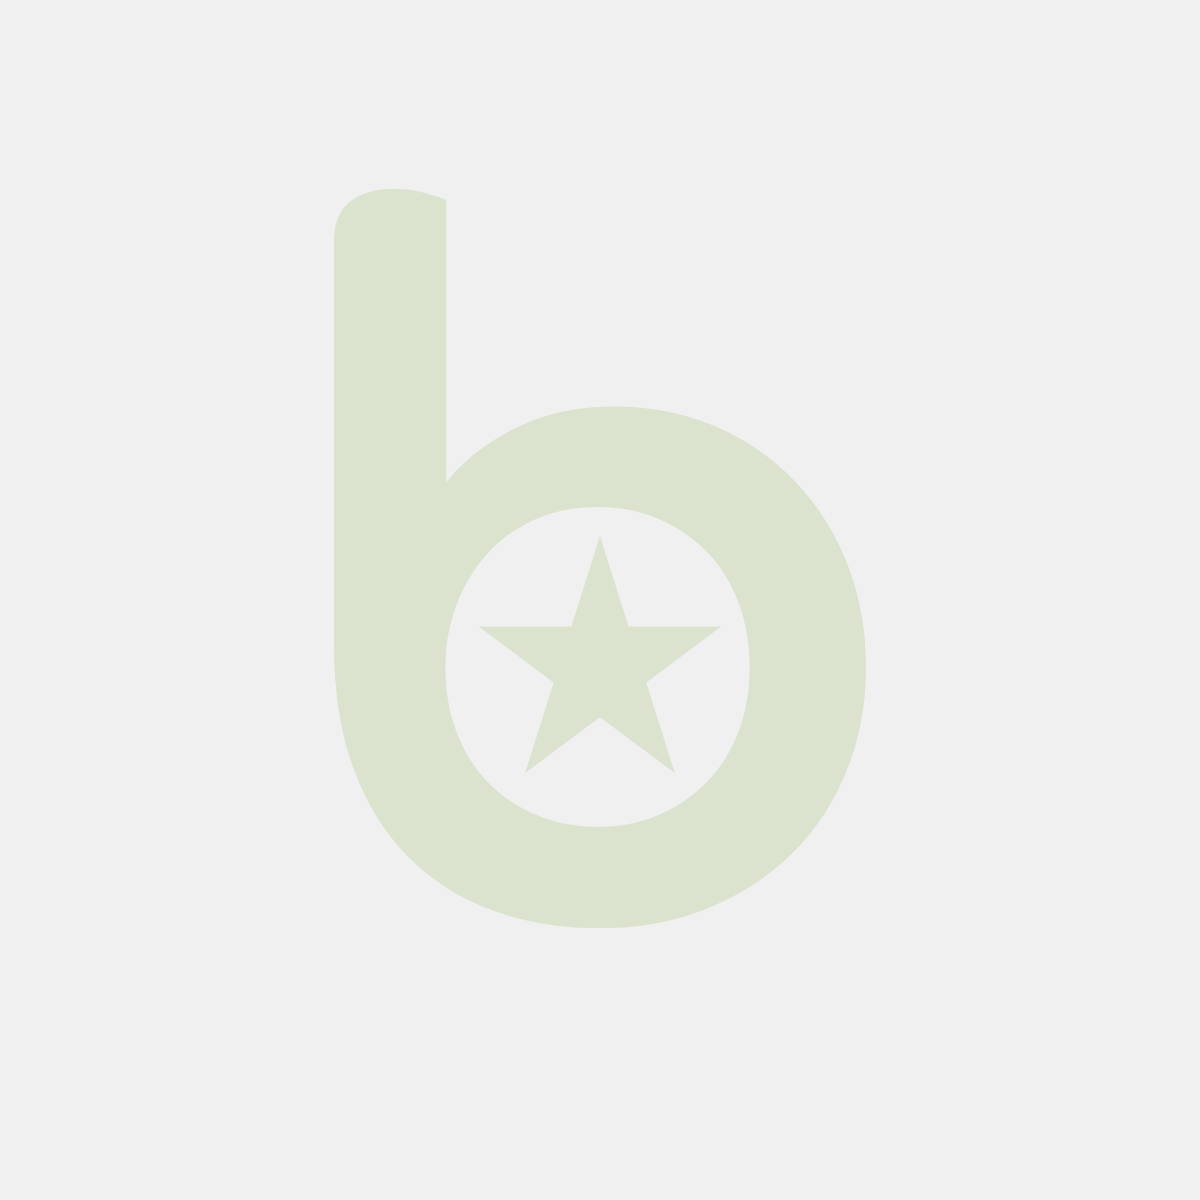 FINGERFOOD - pucharek PRE.GO 70ml transparentna fi.7,05xh.4,68cm op. 50 sztuk